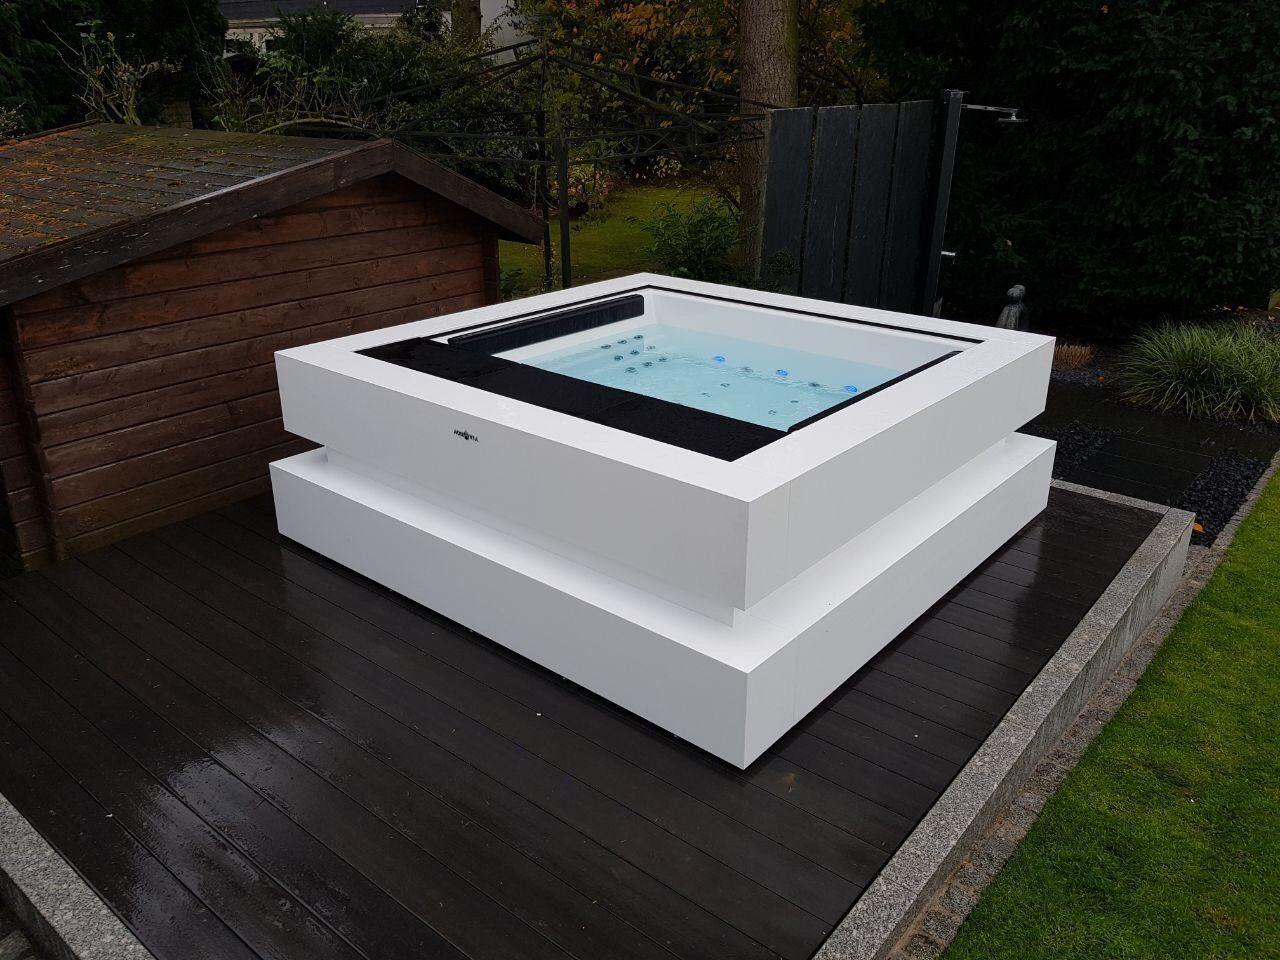 Aquavia Spa Cube Deine Wellnesswelt Whirlpool Garten Aussenwhirlpool Whirlpool